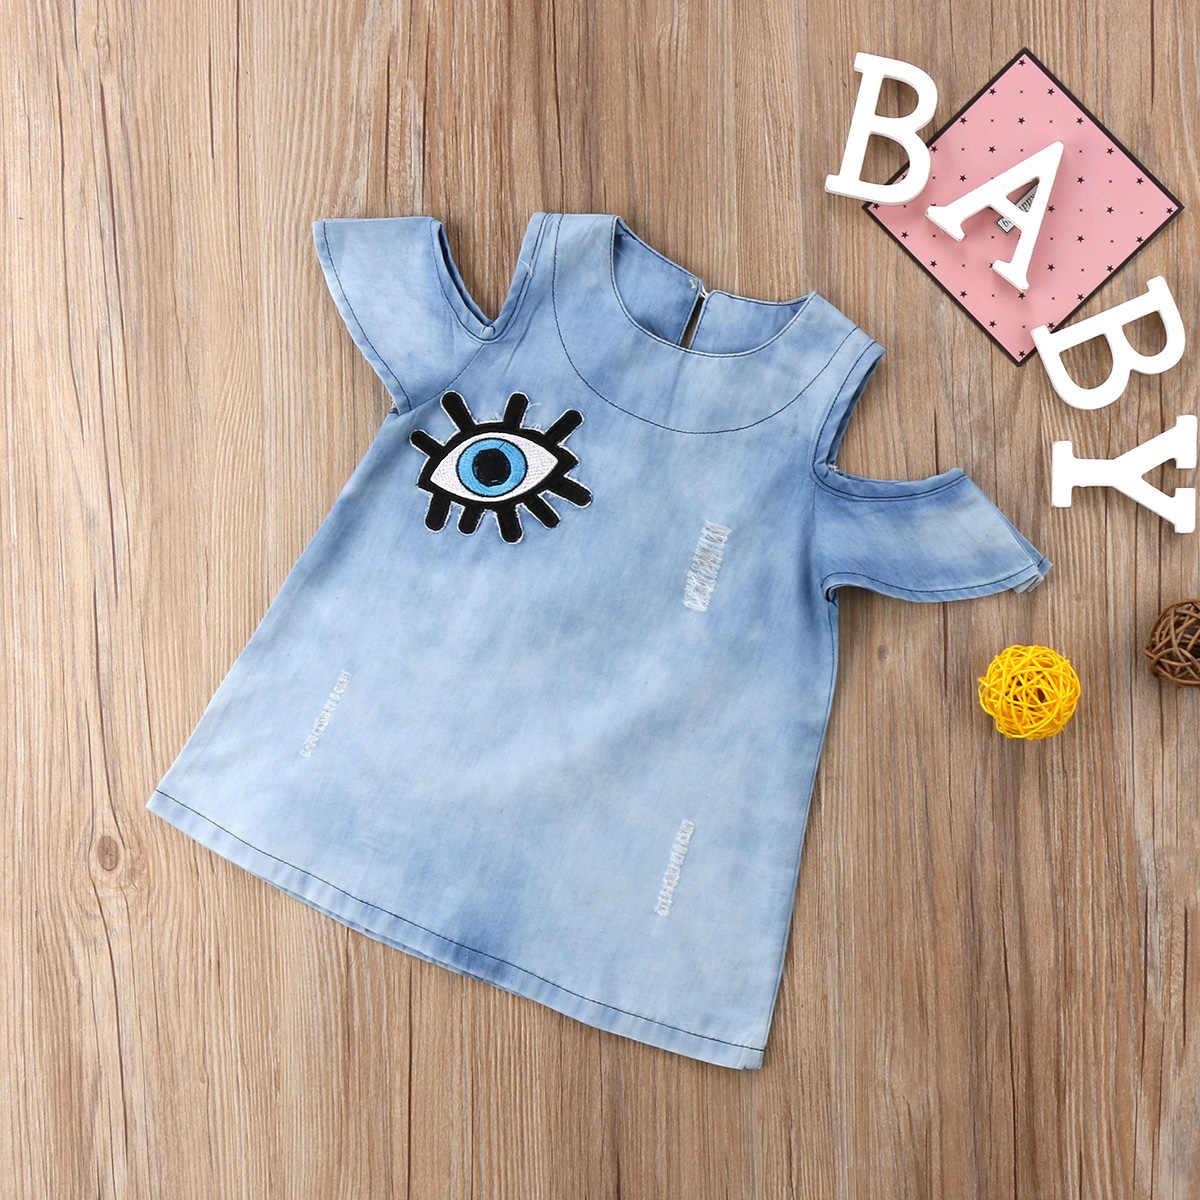 47bce926fa7f ... Fashion Toddler Kids Baby Girls Denim Dress Big Eye Appliques Princess  Dress Girl Outfits Clothes ...